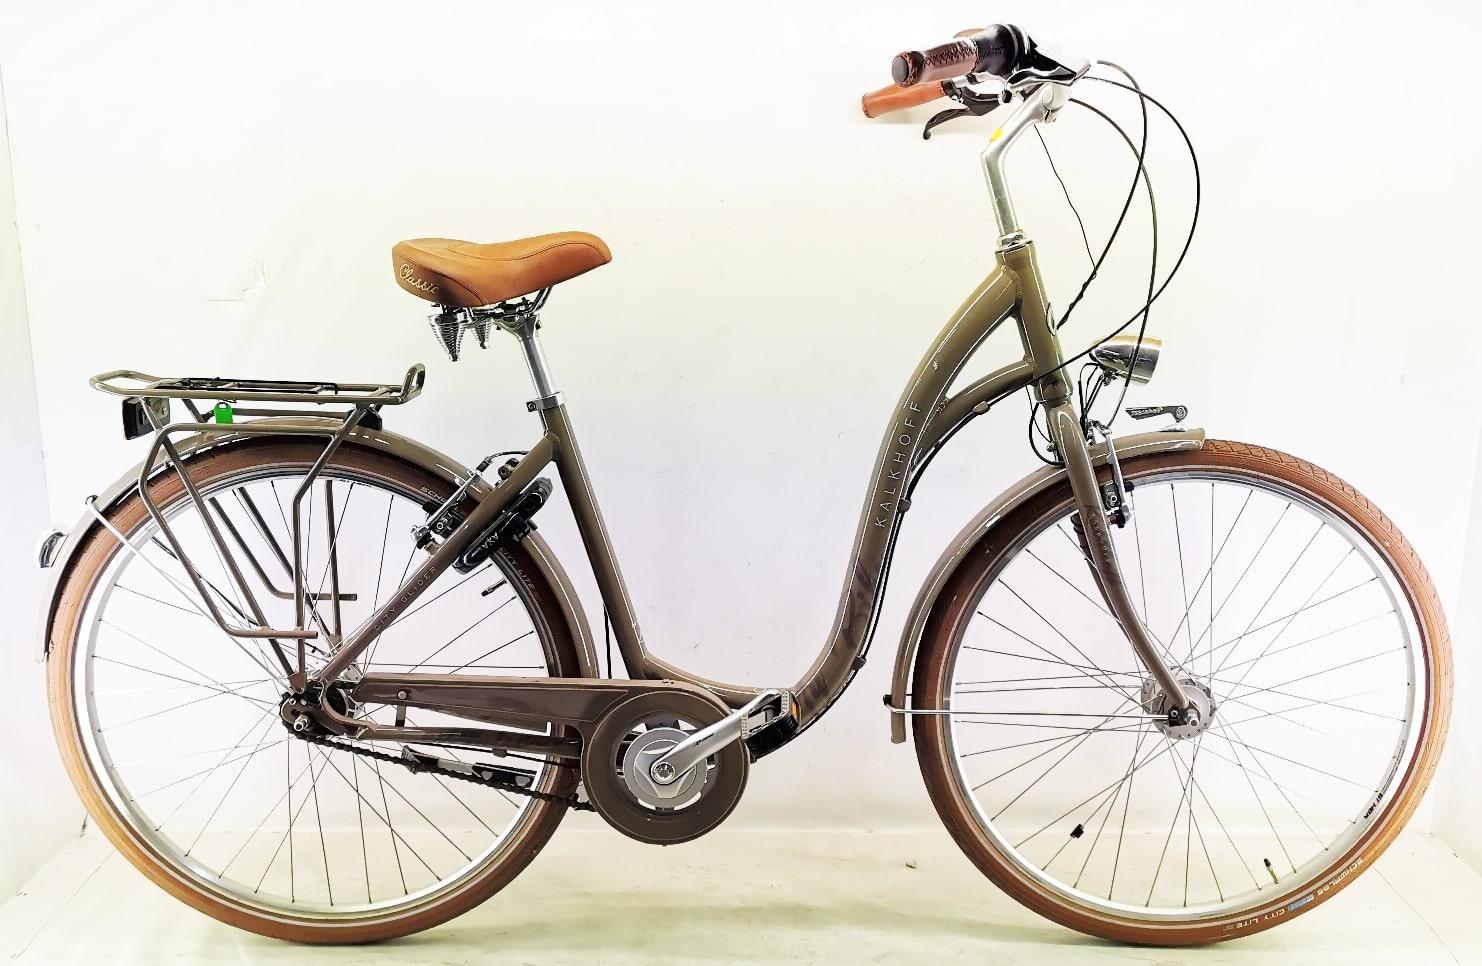 Gebrauchtes Kalkhoff City Glider Damenfahrrad Cityrad